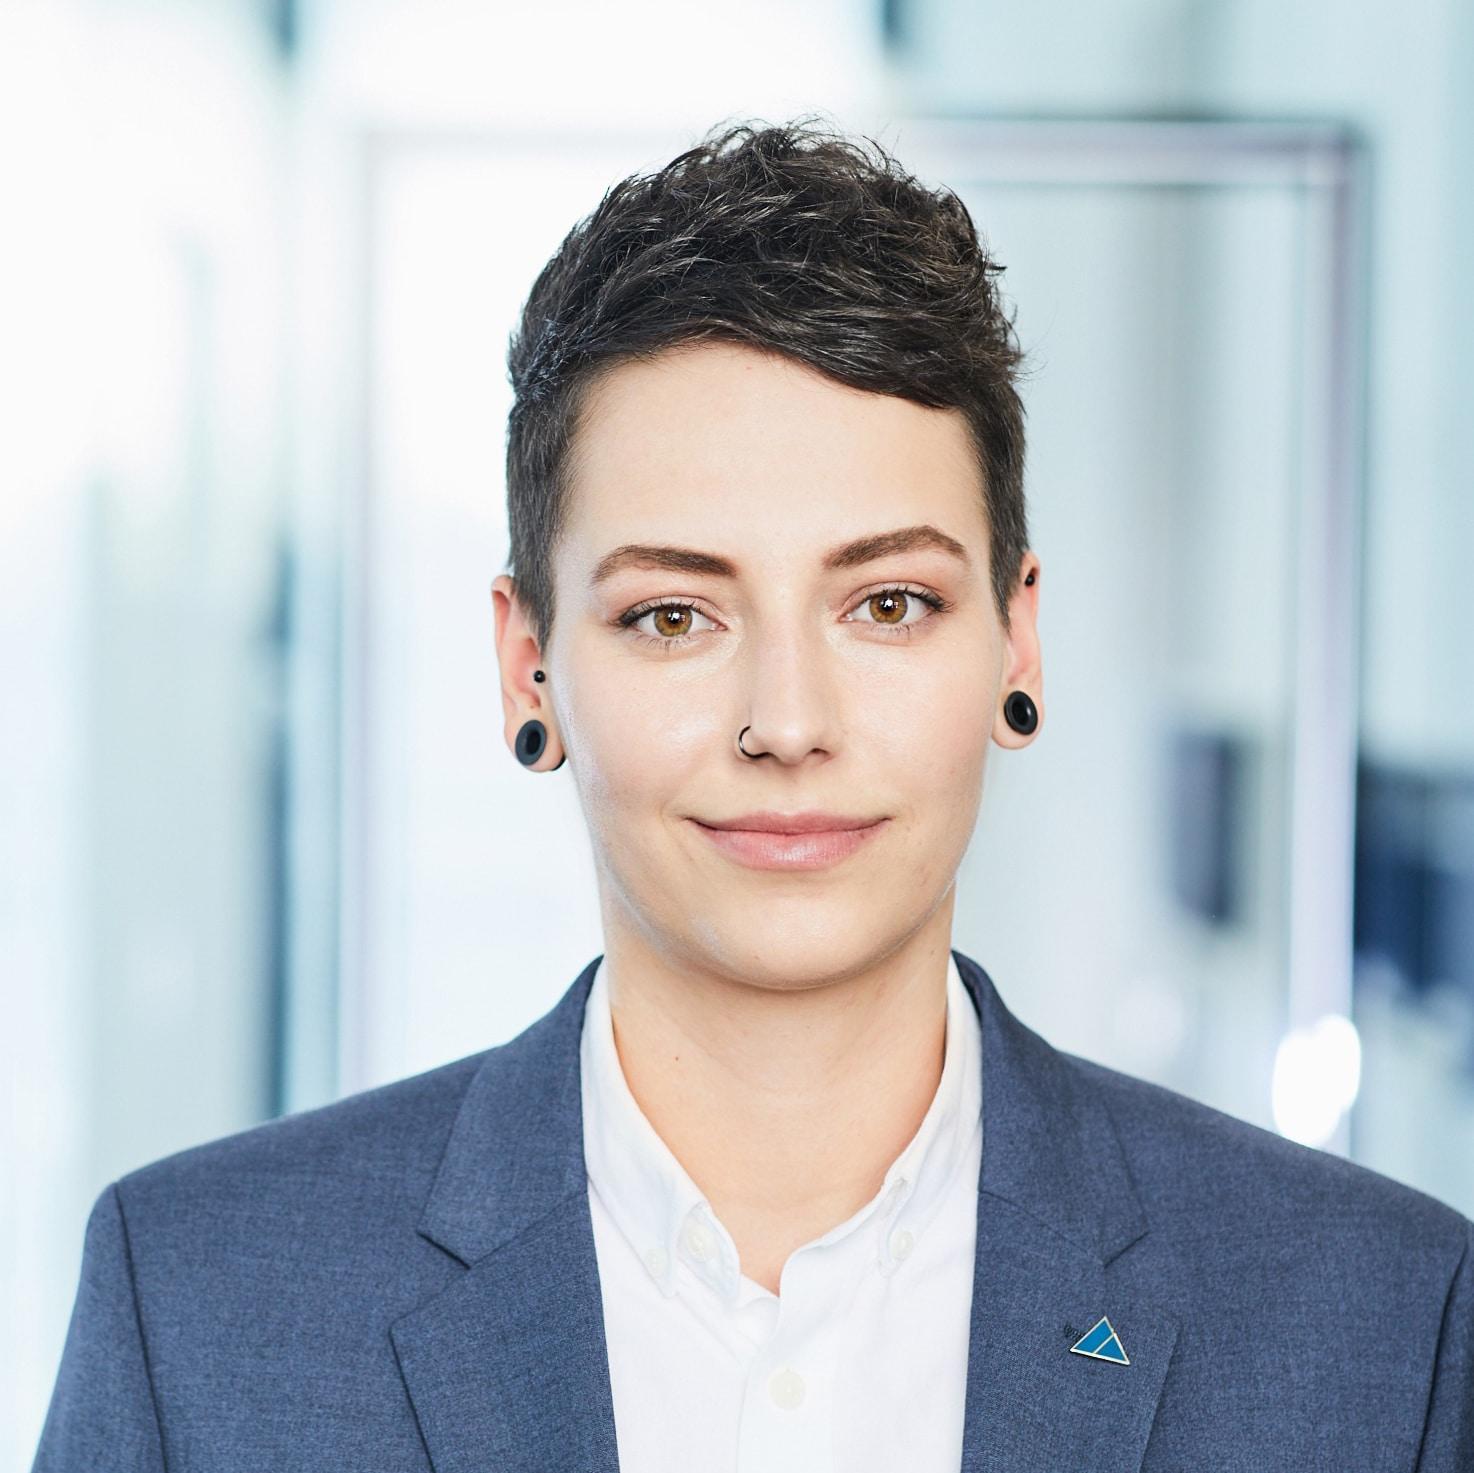 Carina Stellmacher